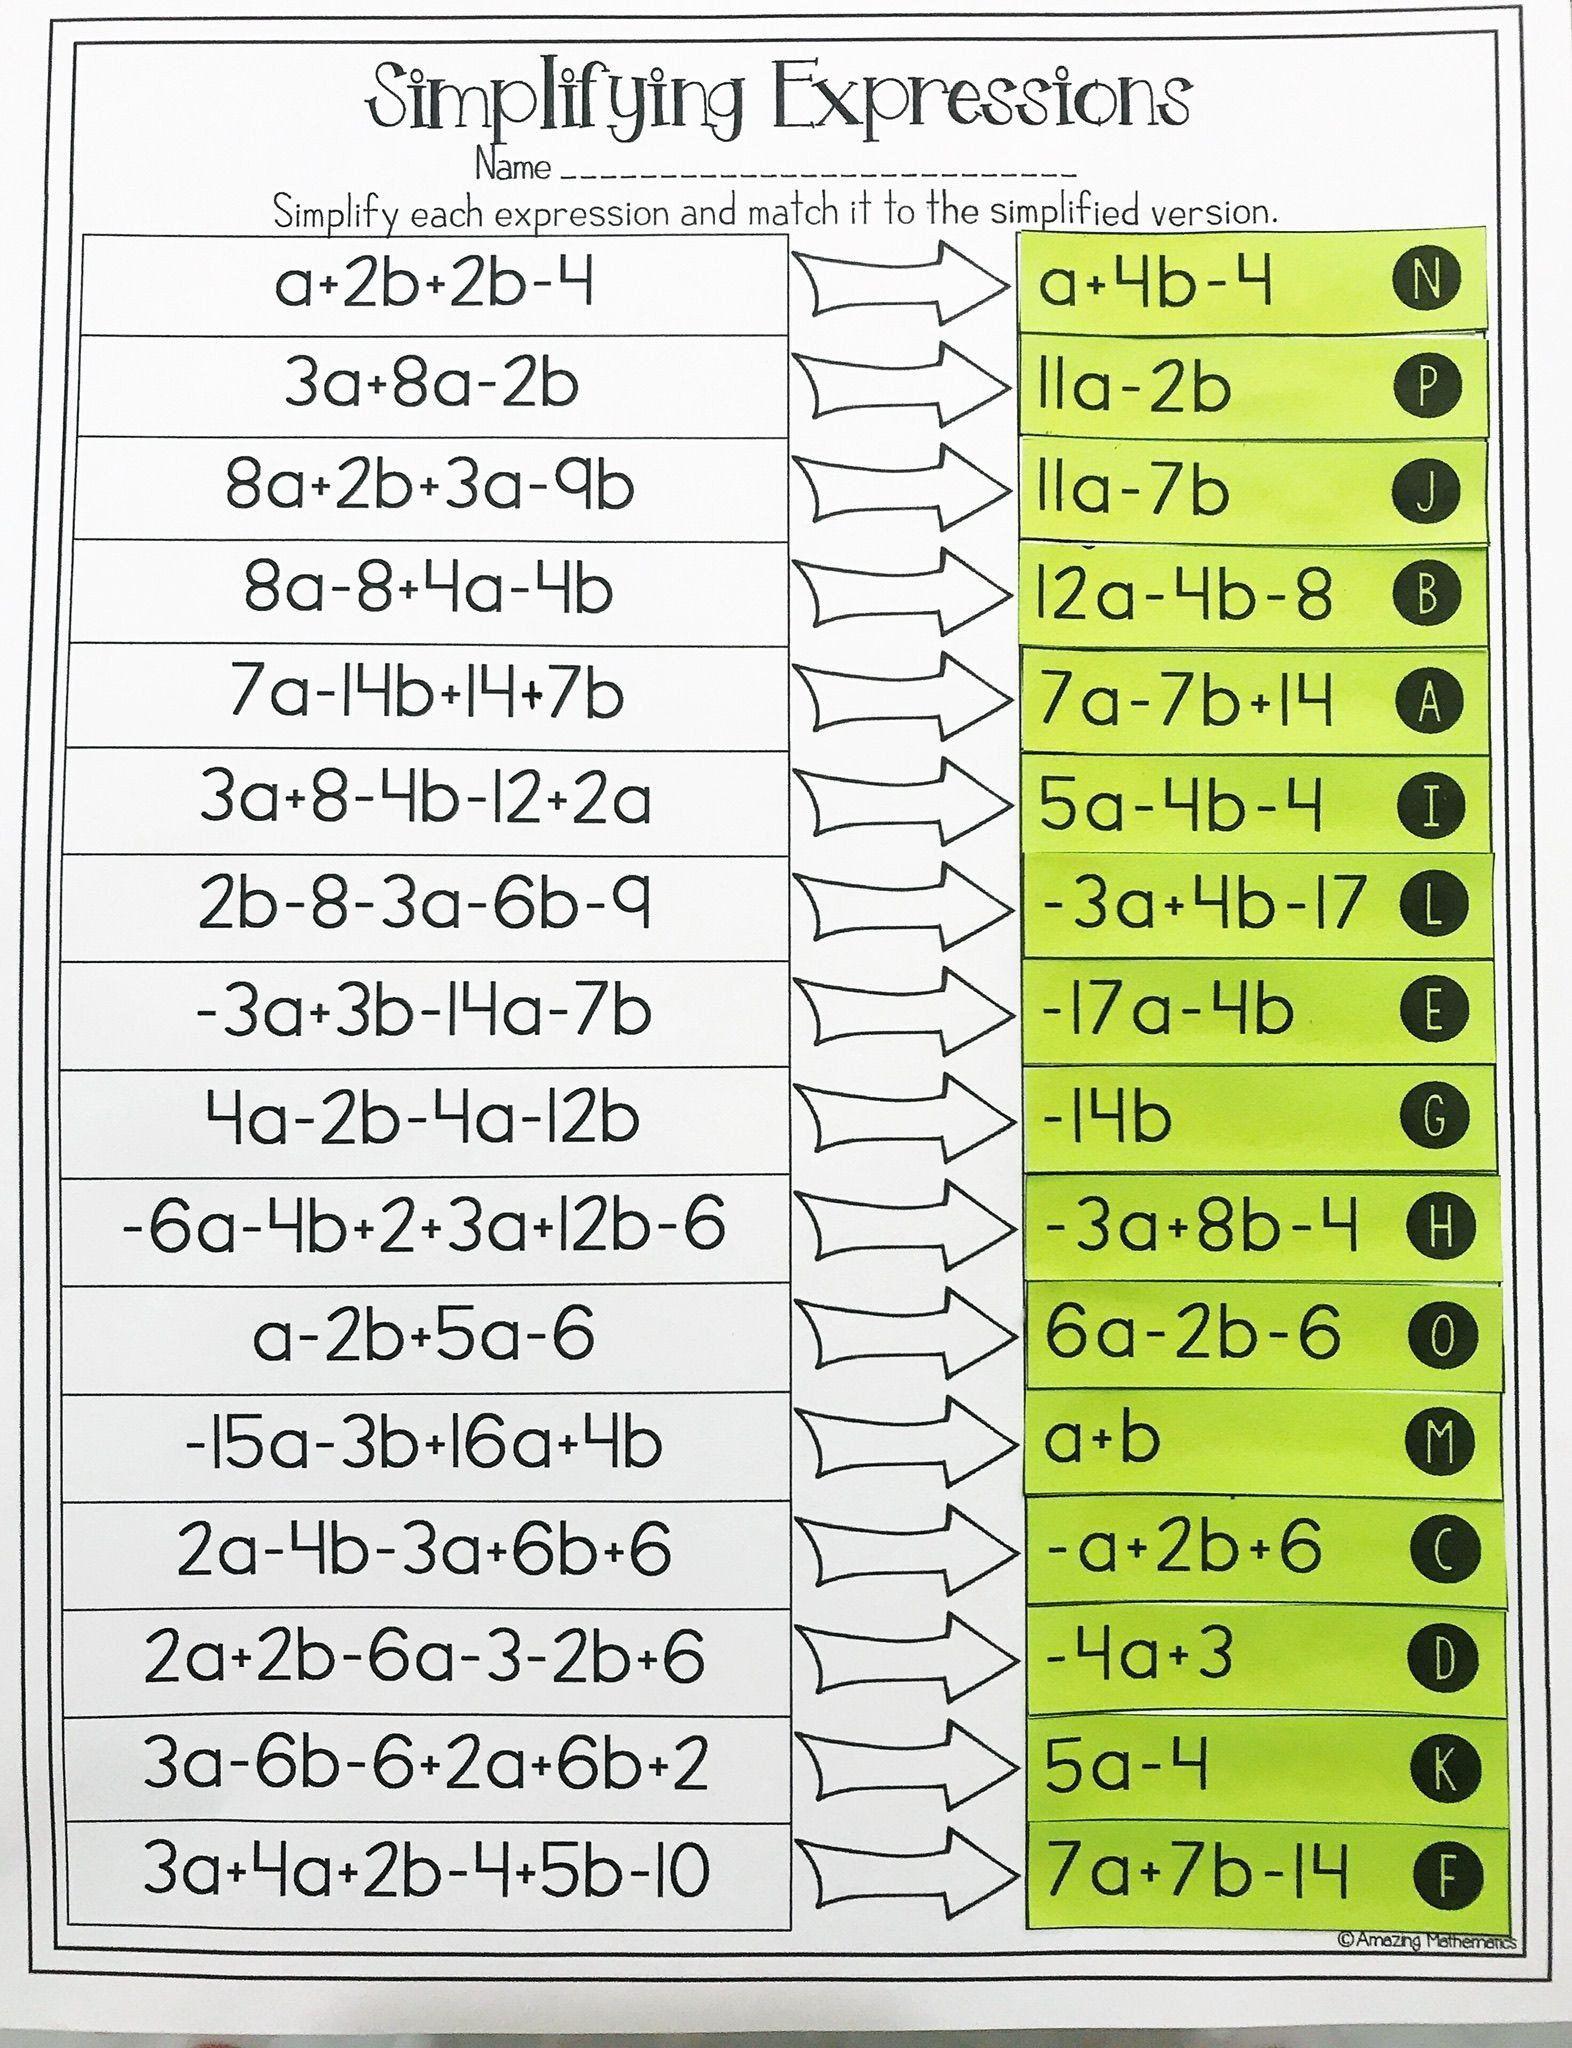 Combining Like Terms Practice Worksheet Bining Like Terms Practice Worksheet Bining Like Terms